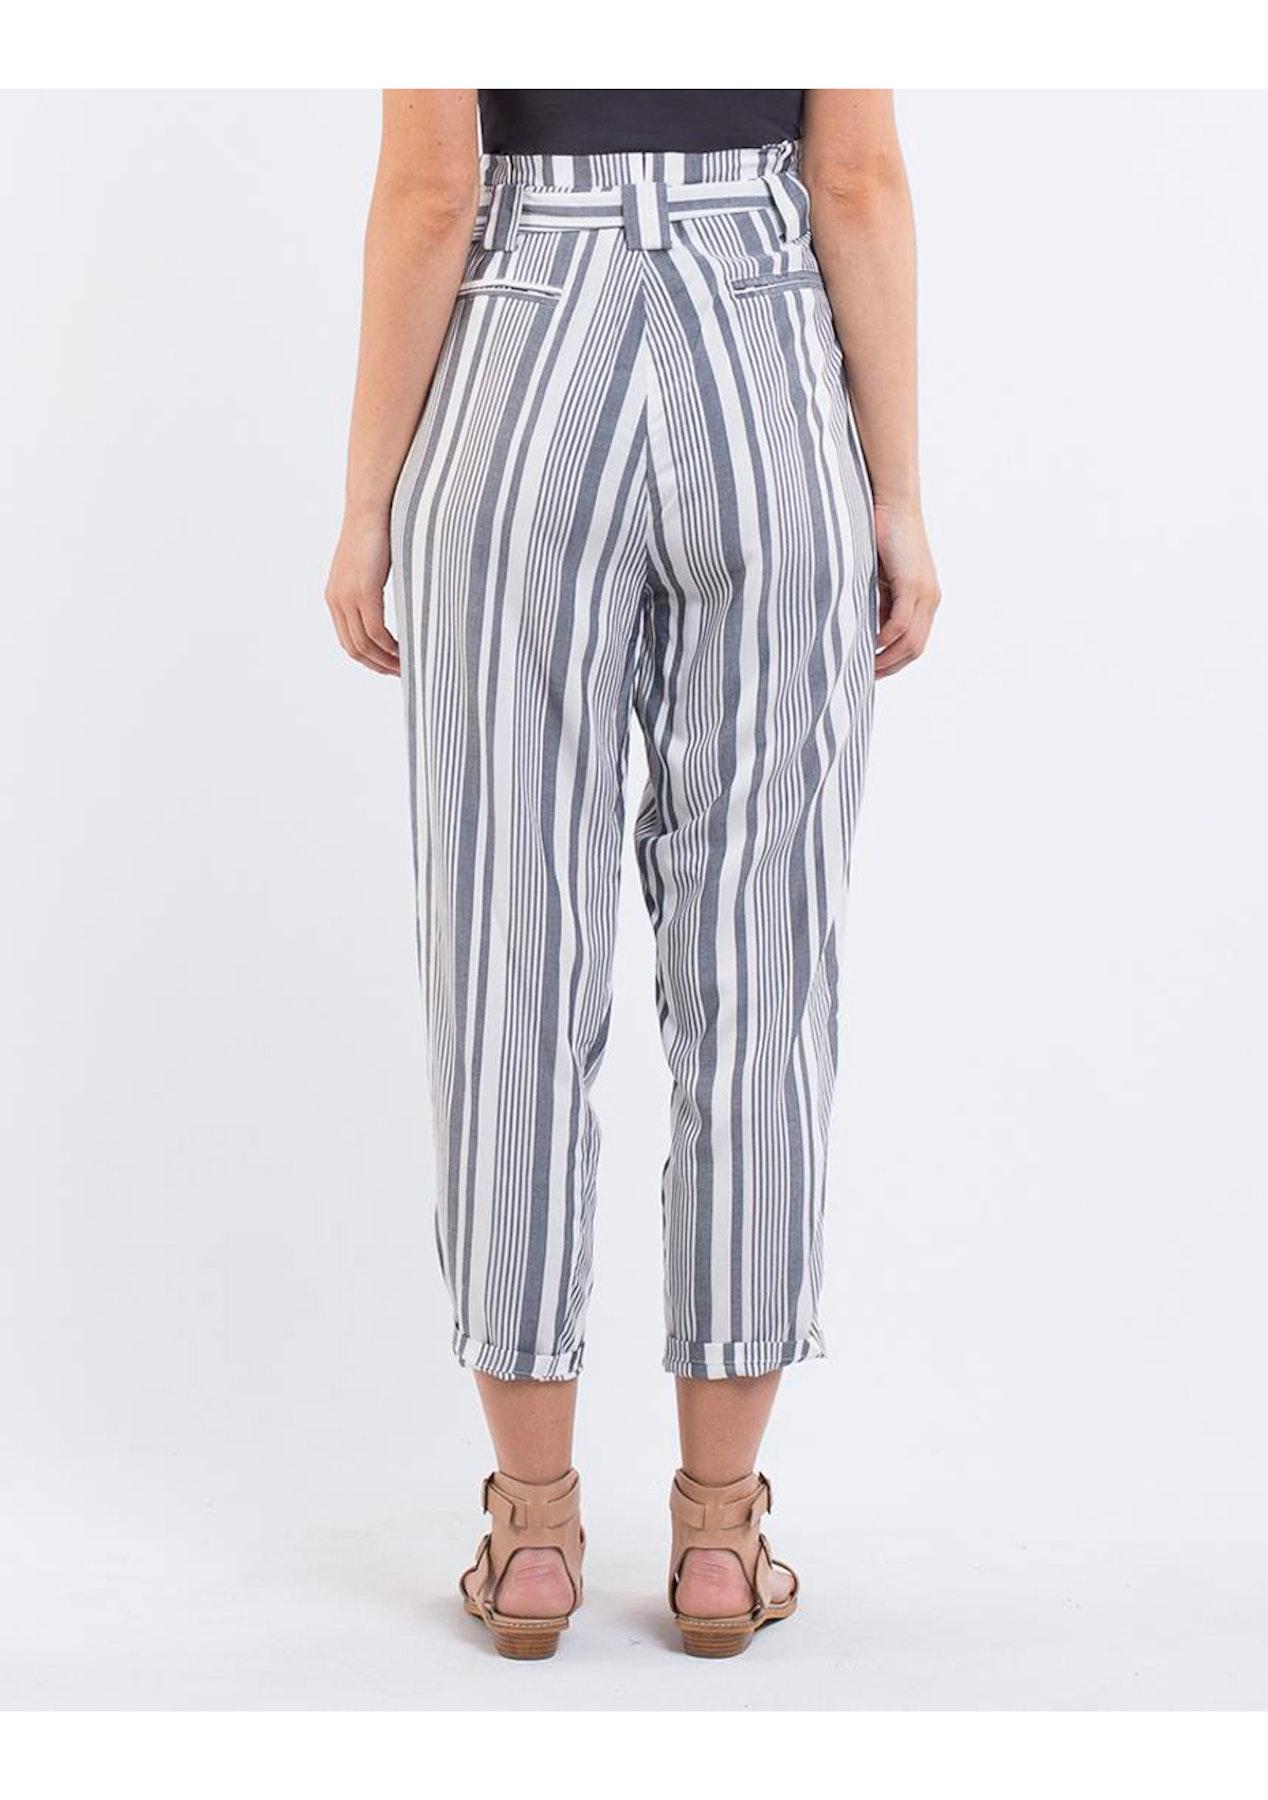 f77d6d7437f Jorge - Straight Up Pant - Stripe - Womens Garage Sale - Onceit